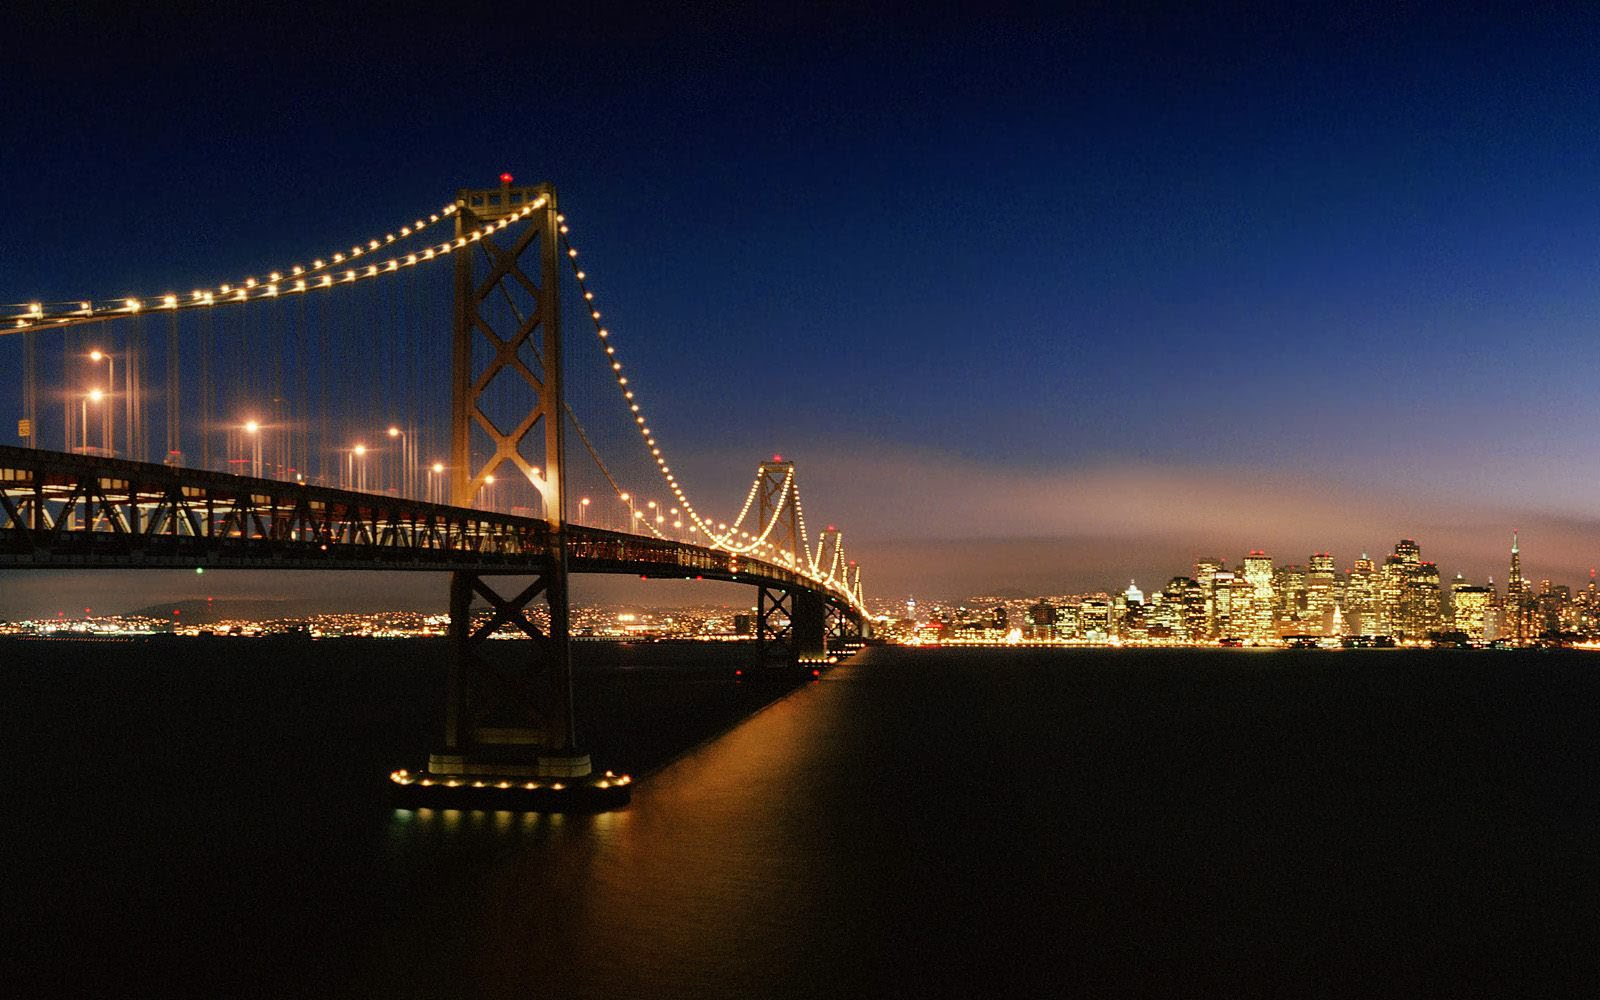 light bridge wallpaper - photo #4